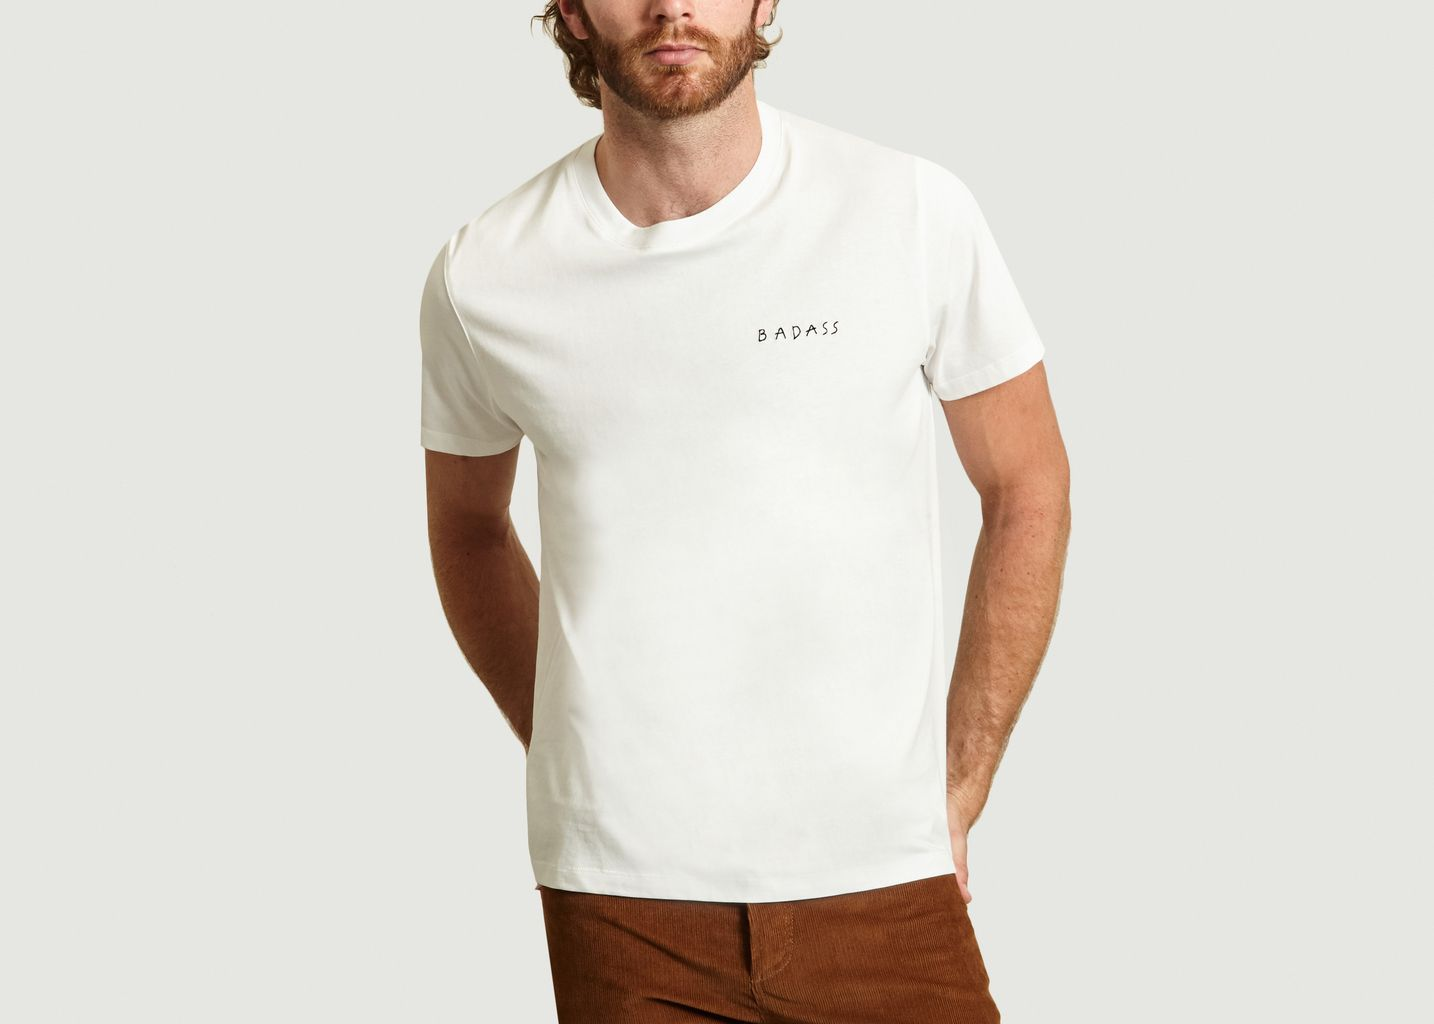 T-shirt Badass - Maison Labiche